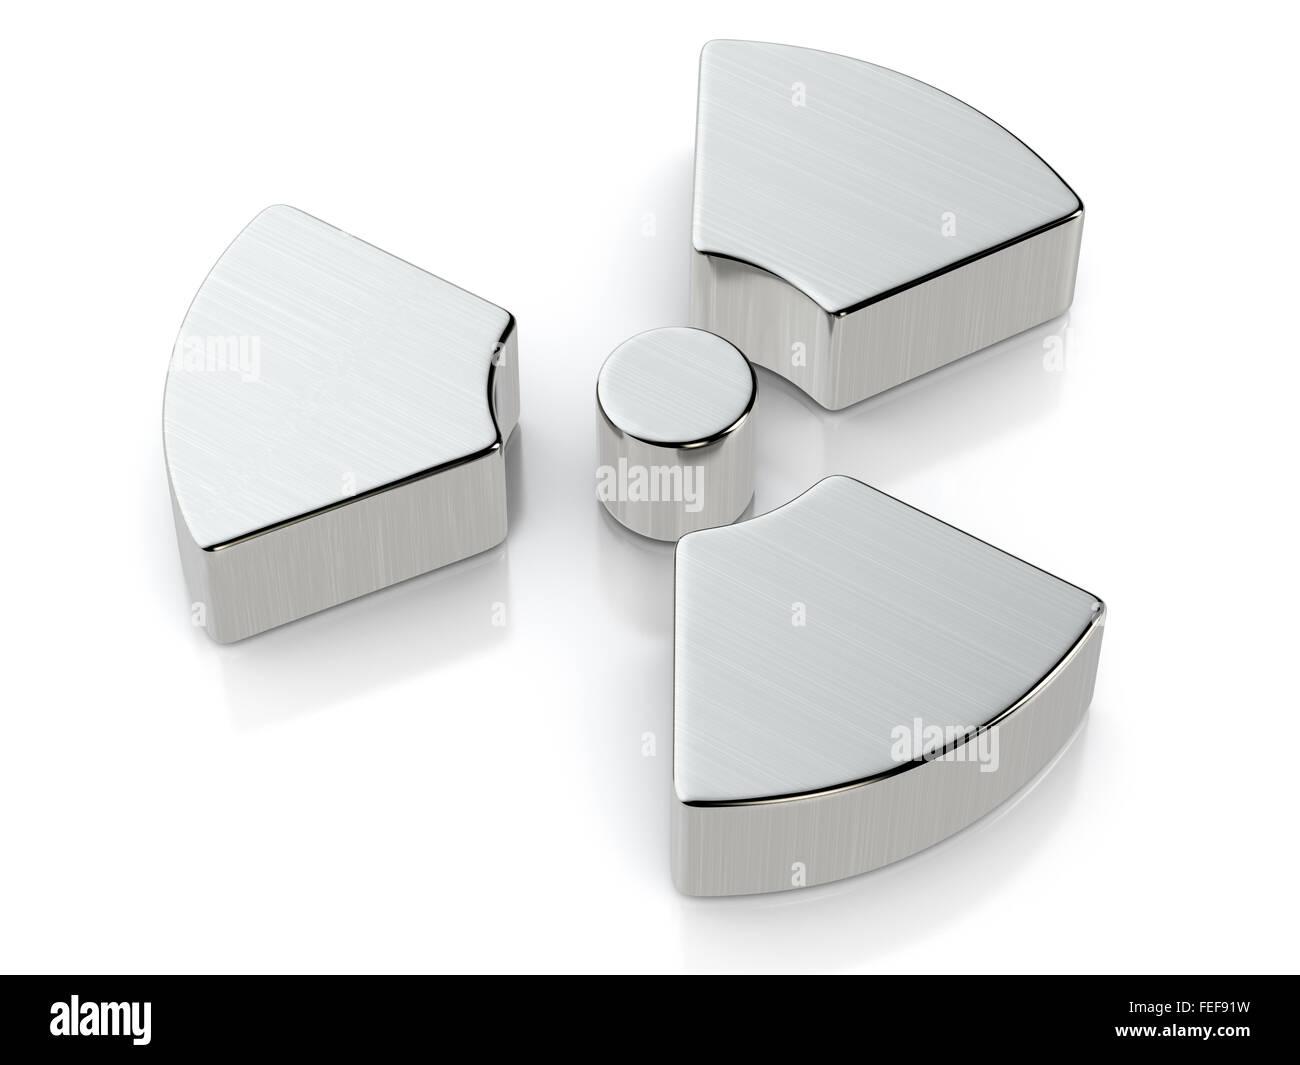 Metallic radiation symbol on a white background. - Stock Image